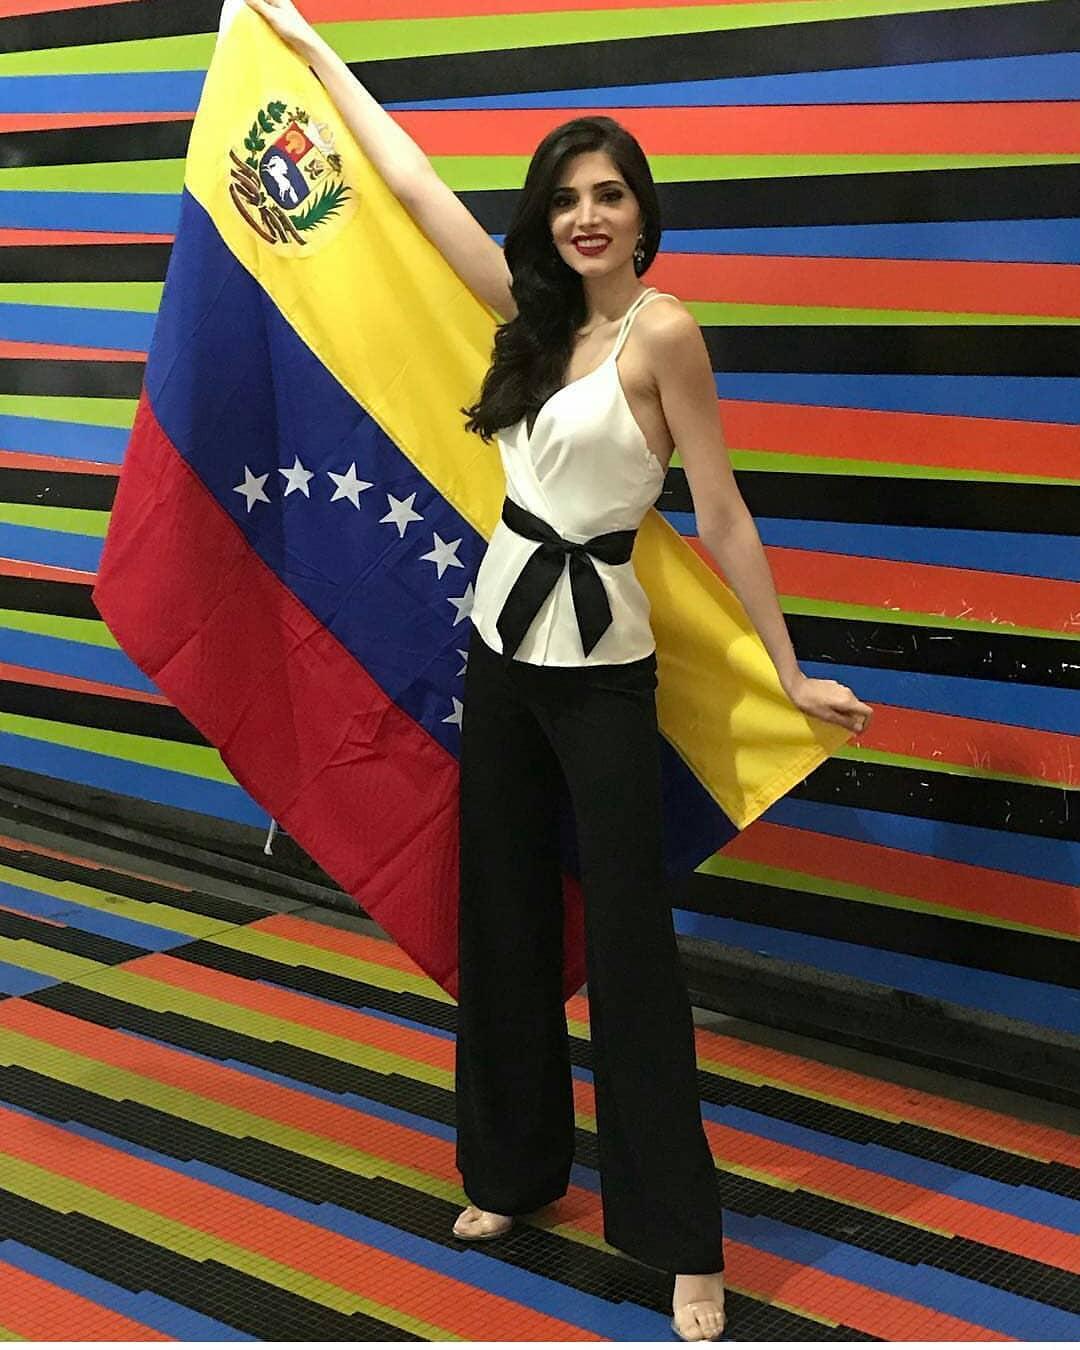 nariman battikha, reyna hispanoamericana 2018/top 10 de miss supranational 2018. - Página 2 43308410